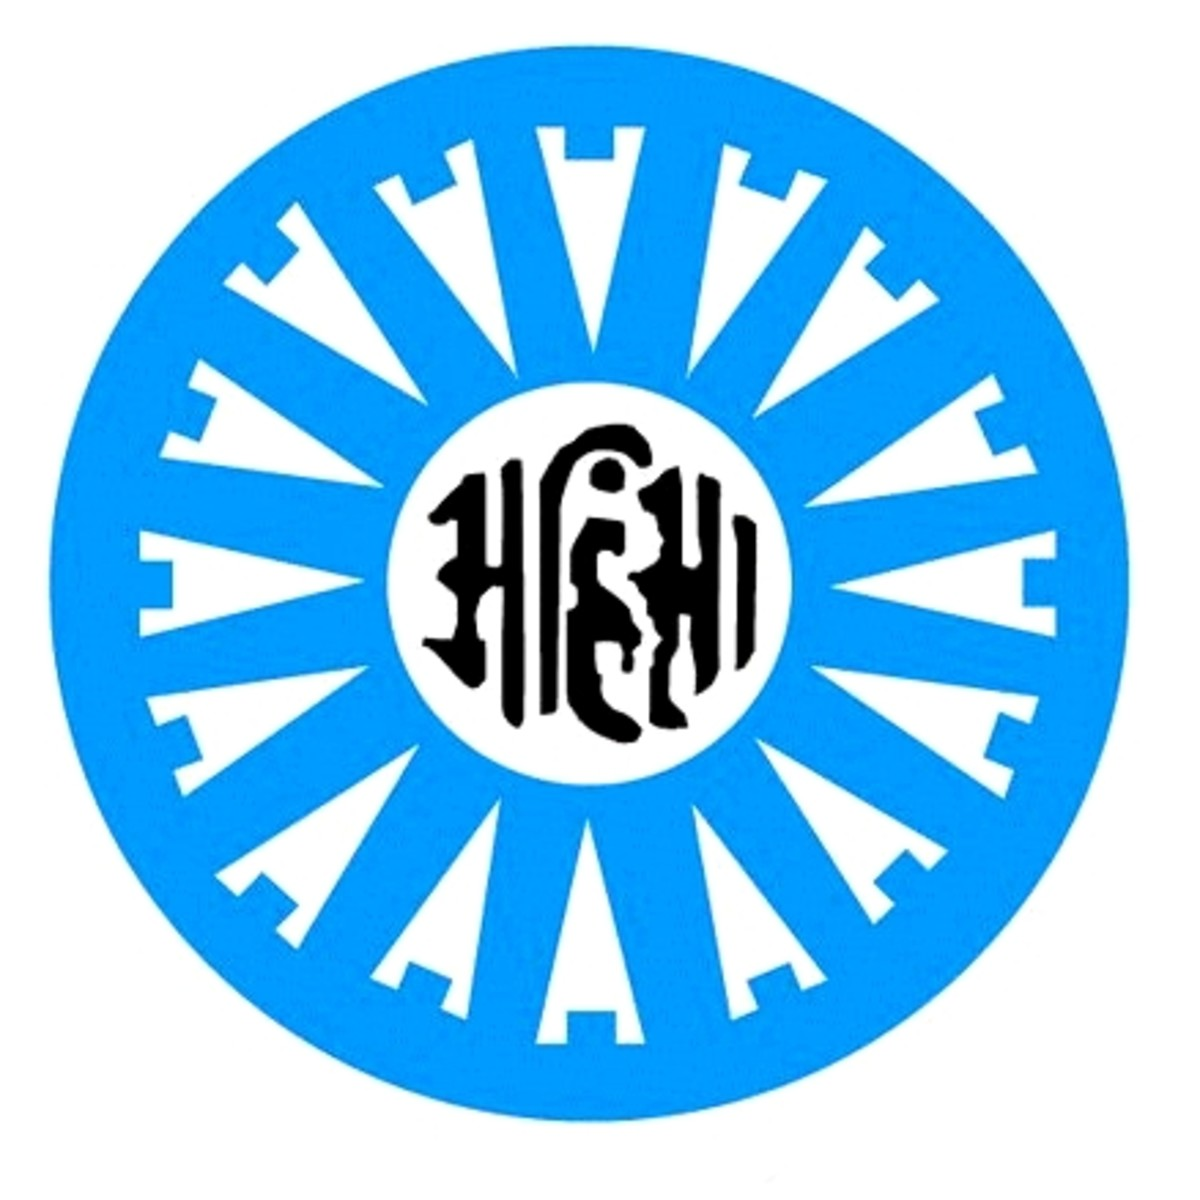 Ahimsa Wheel